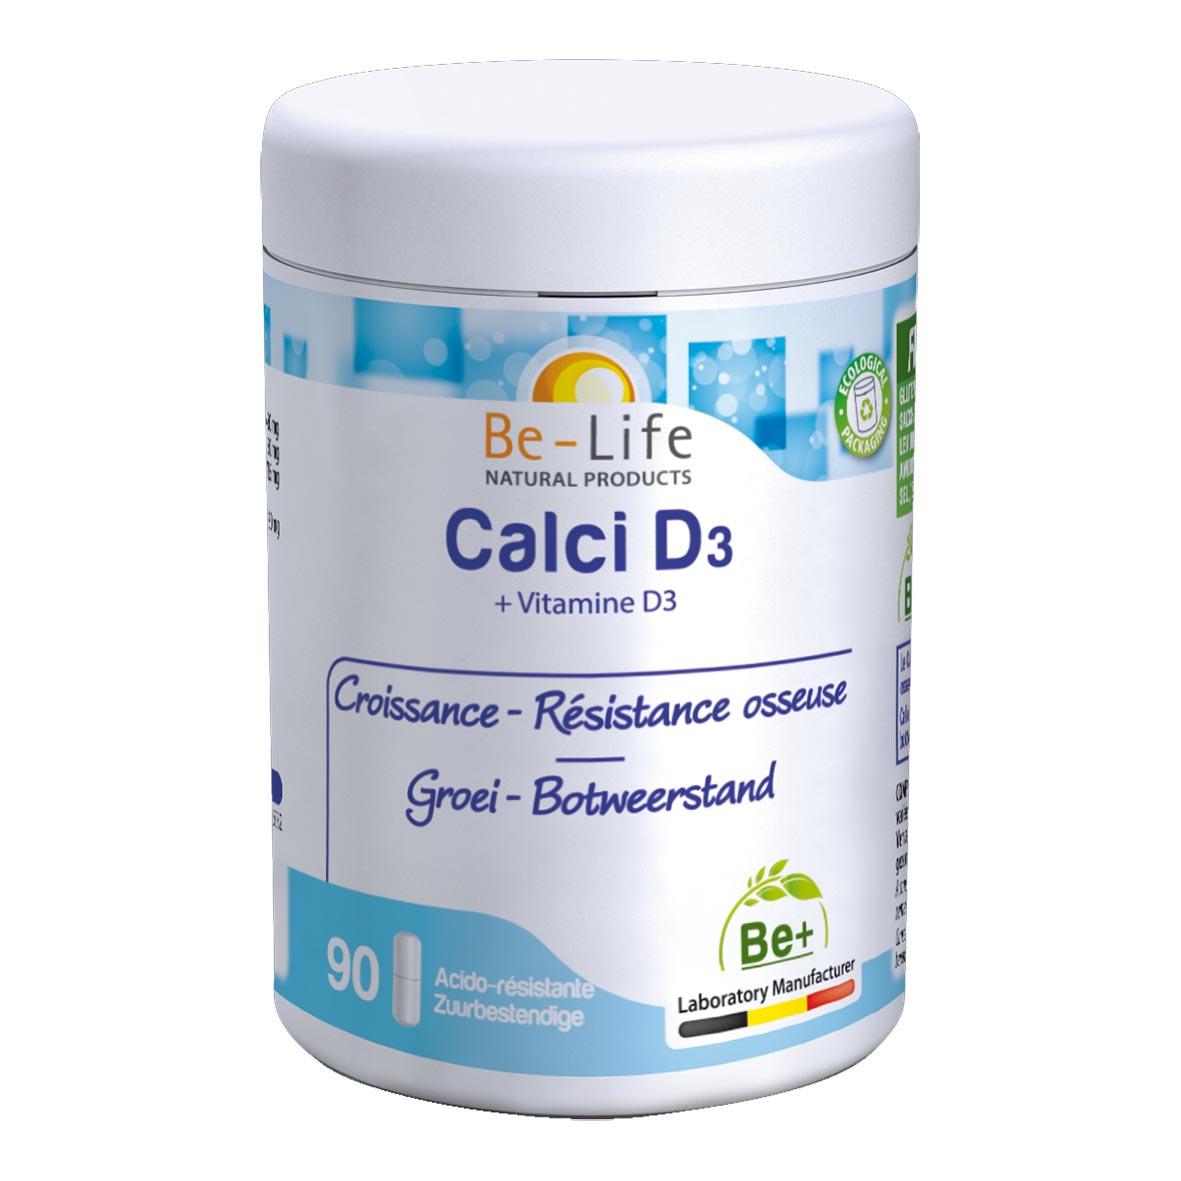 Calci D3 90 gélules